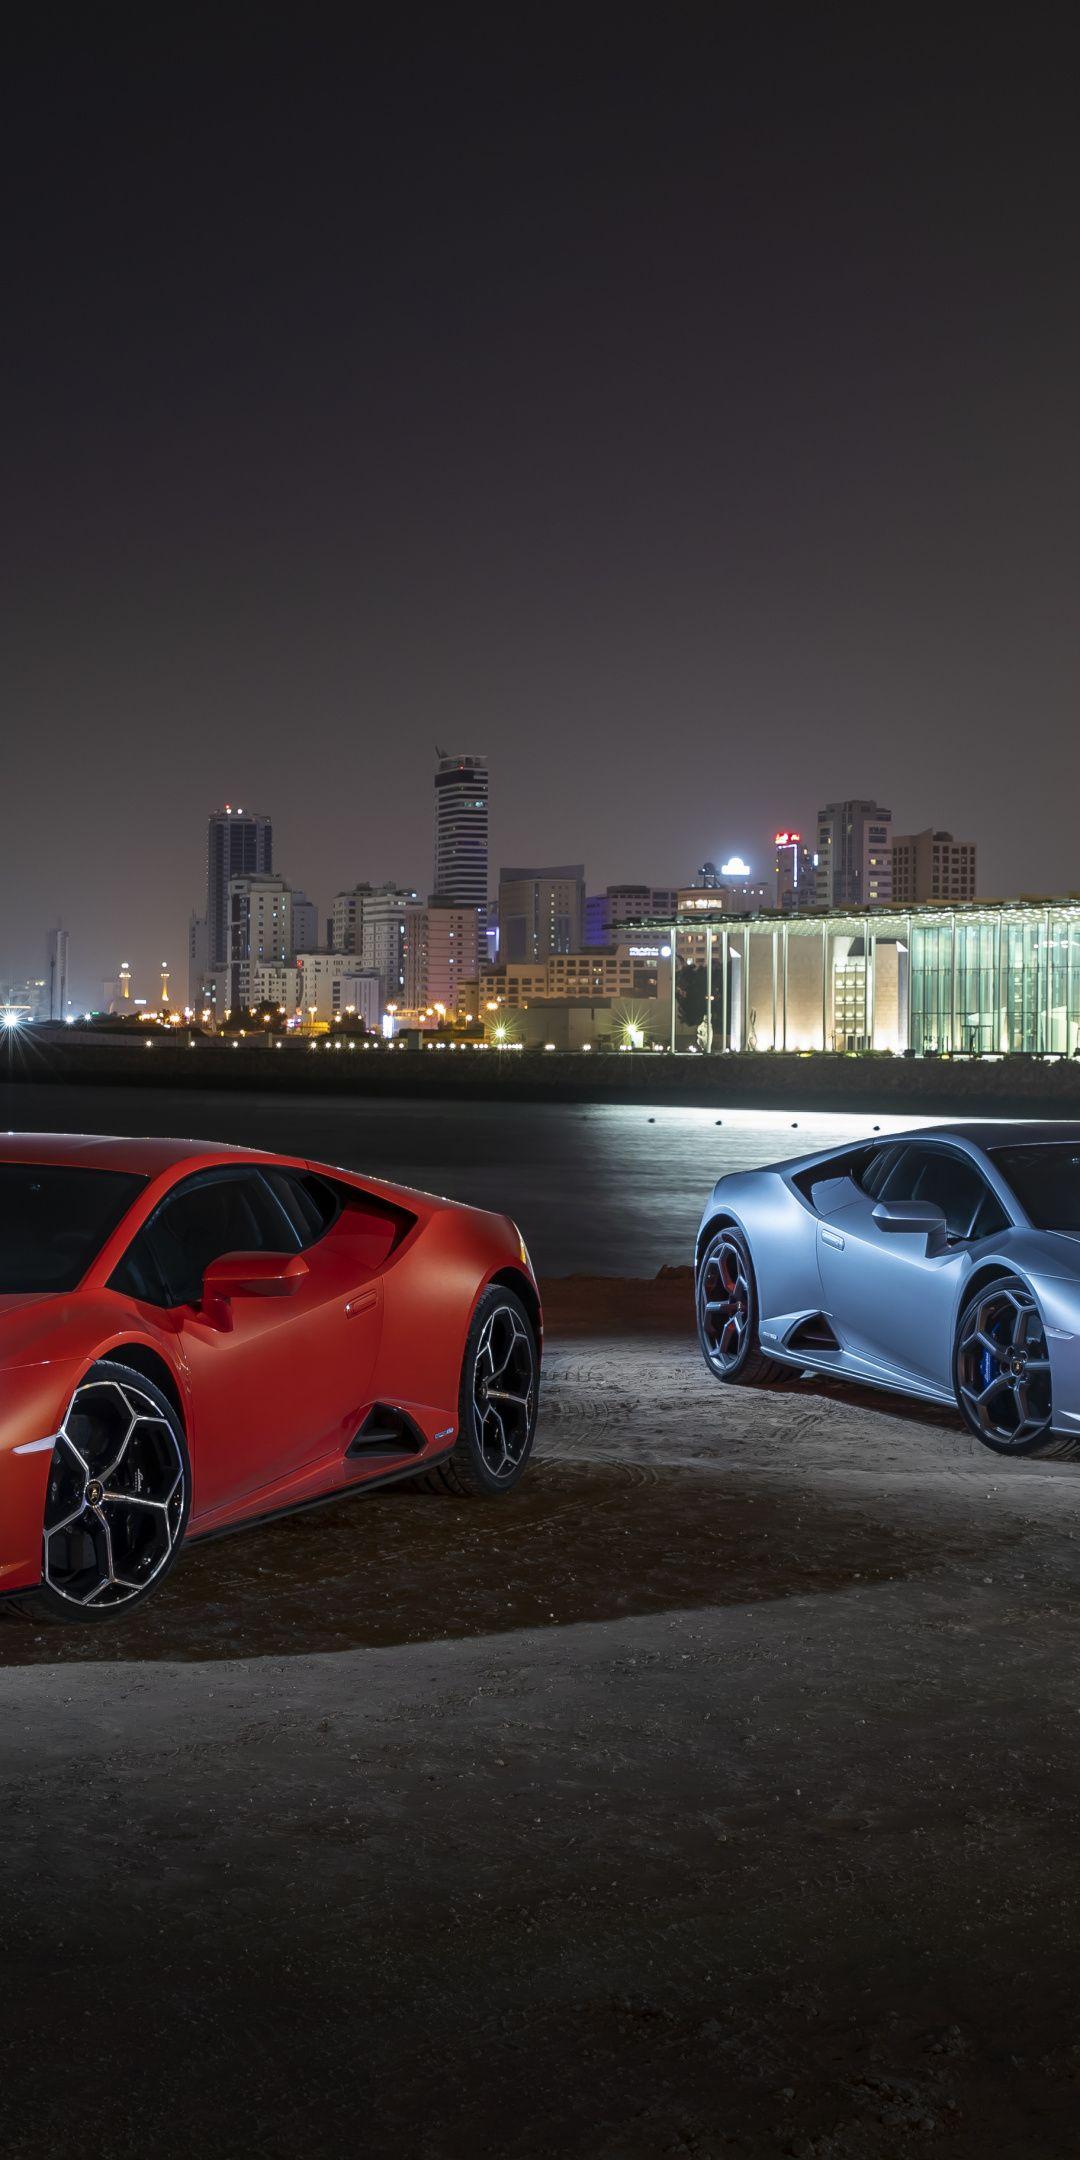 2019 Lamborghini Huracan Evo Red And Blue Cars 1080x2160